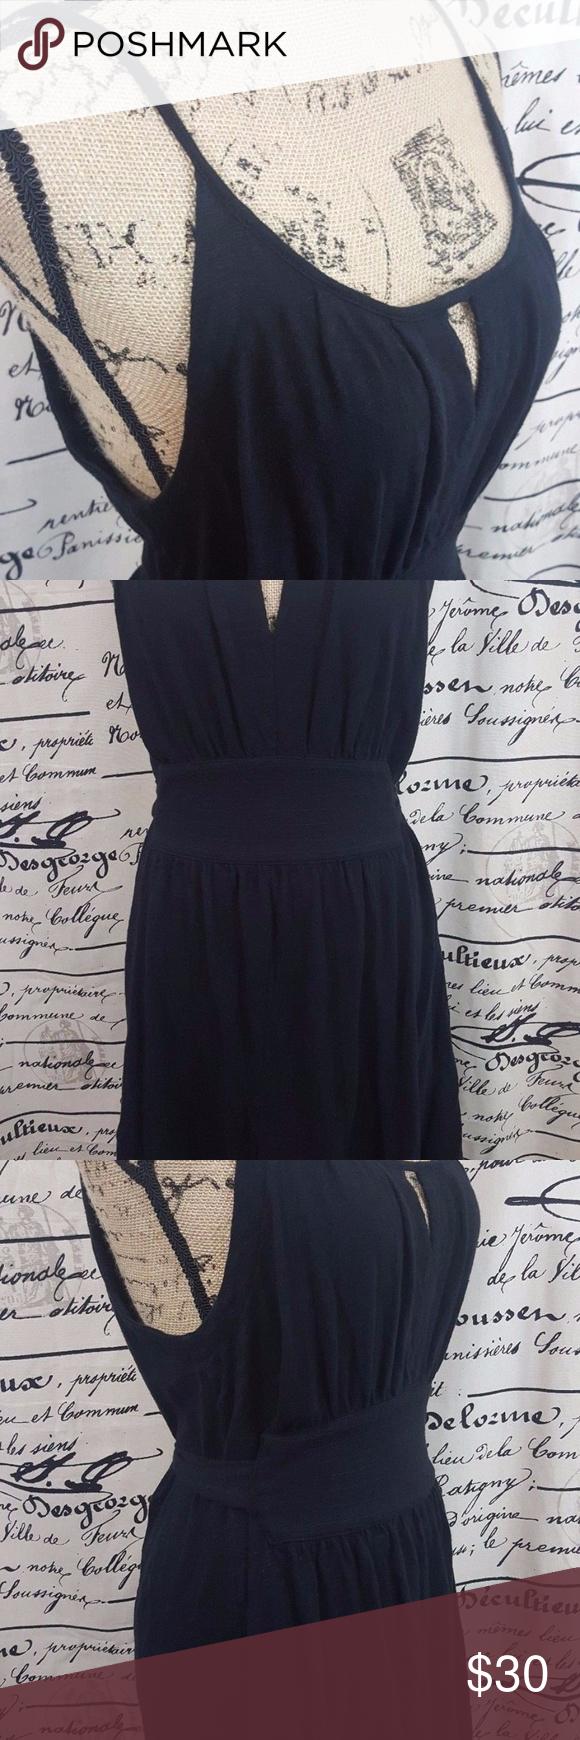 Philosophy republic clothing black sexy dress sexy summer dresses